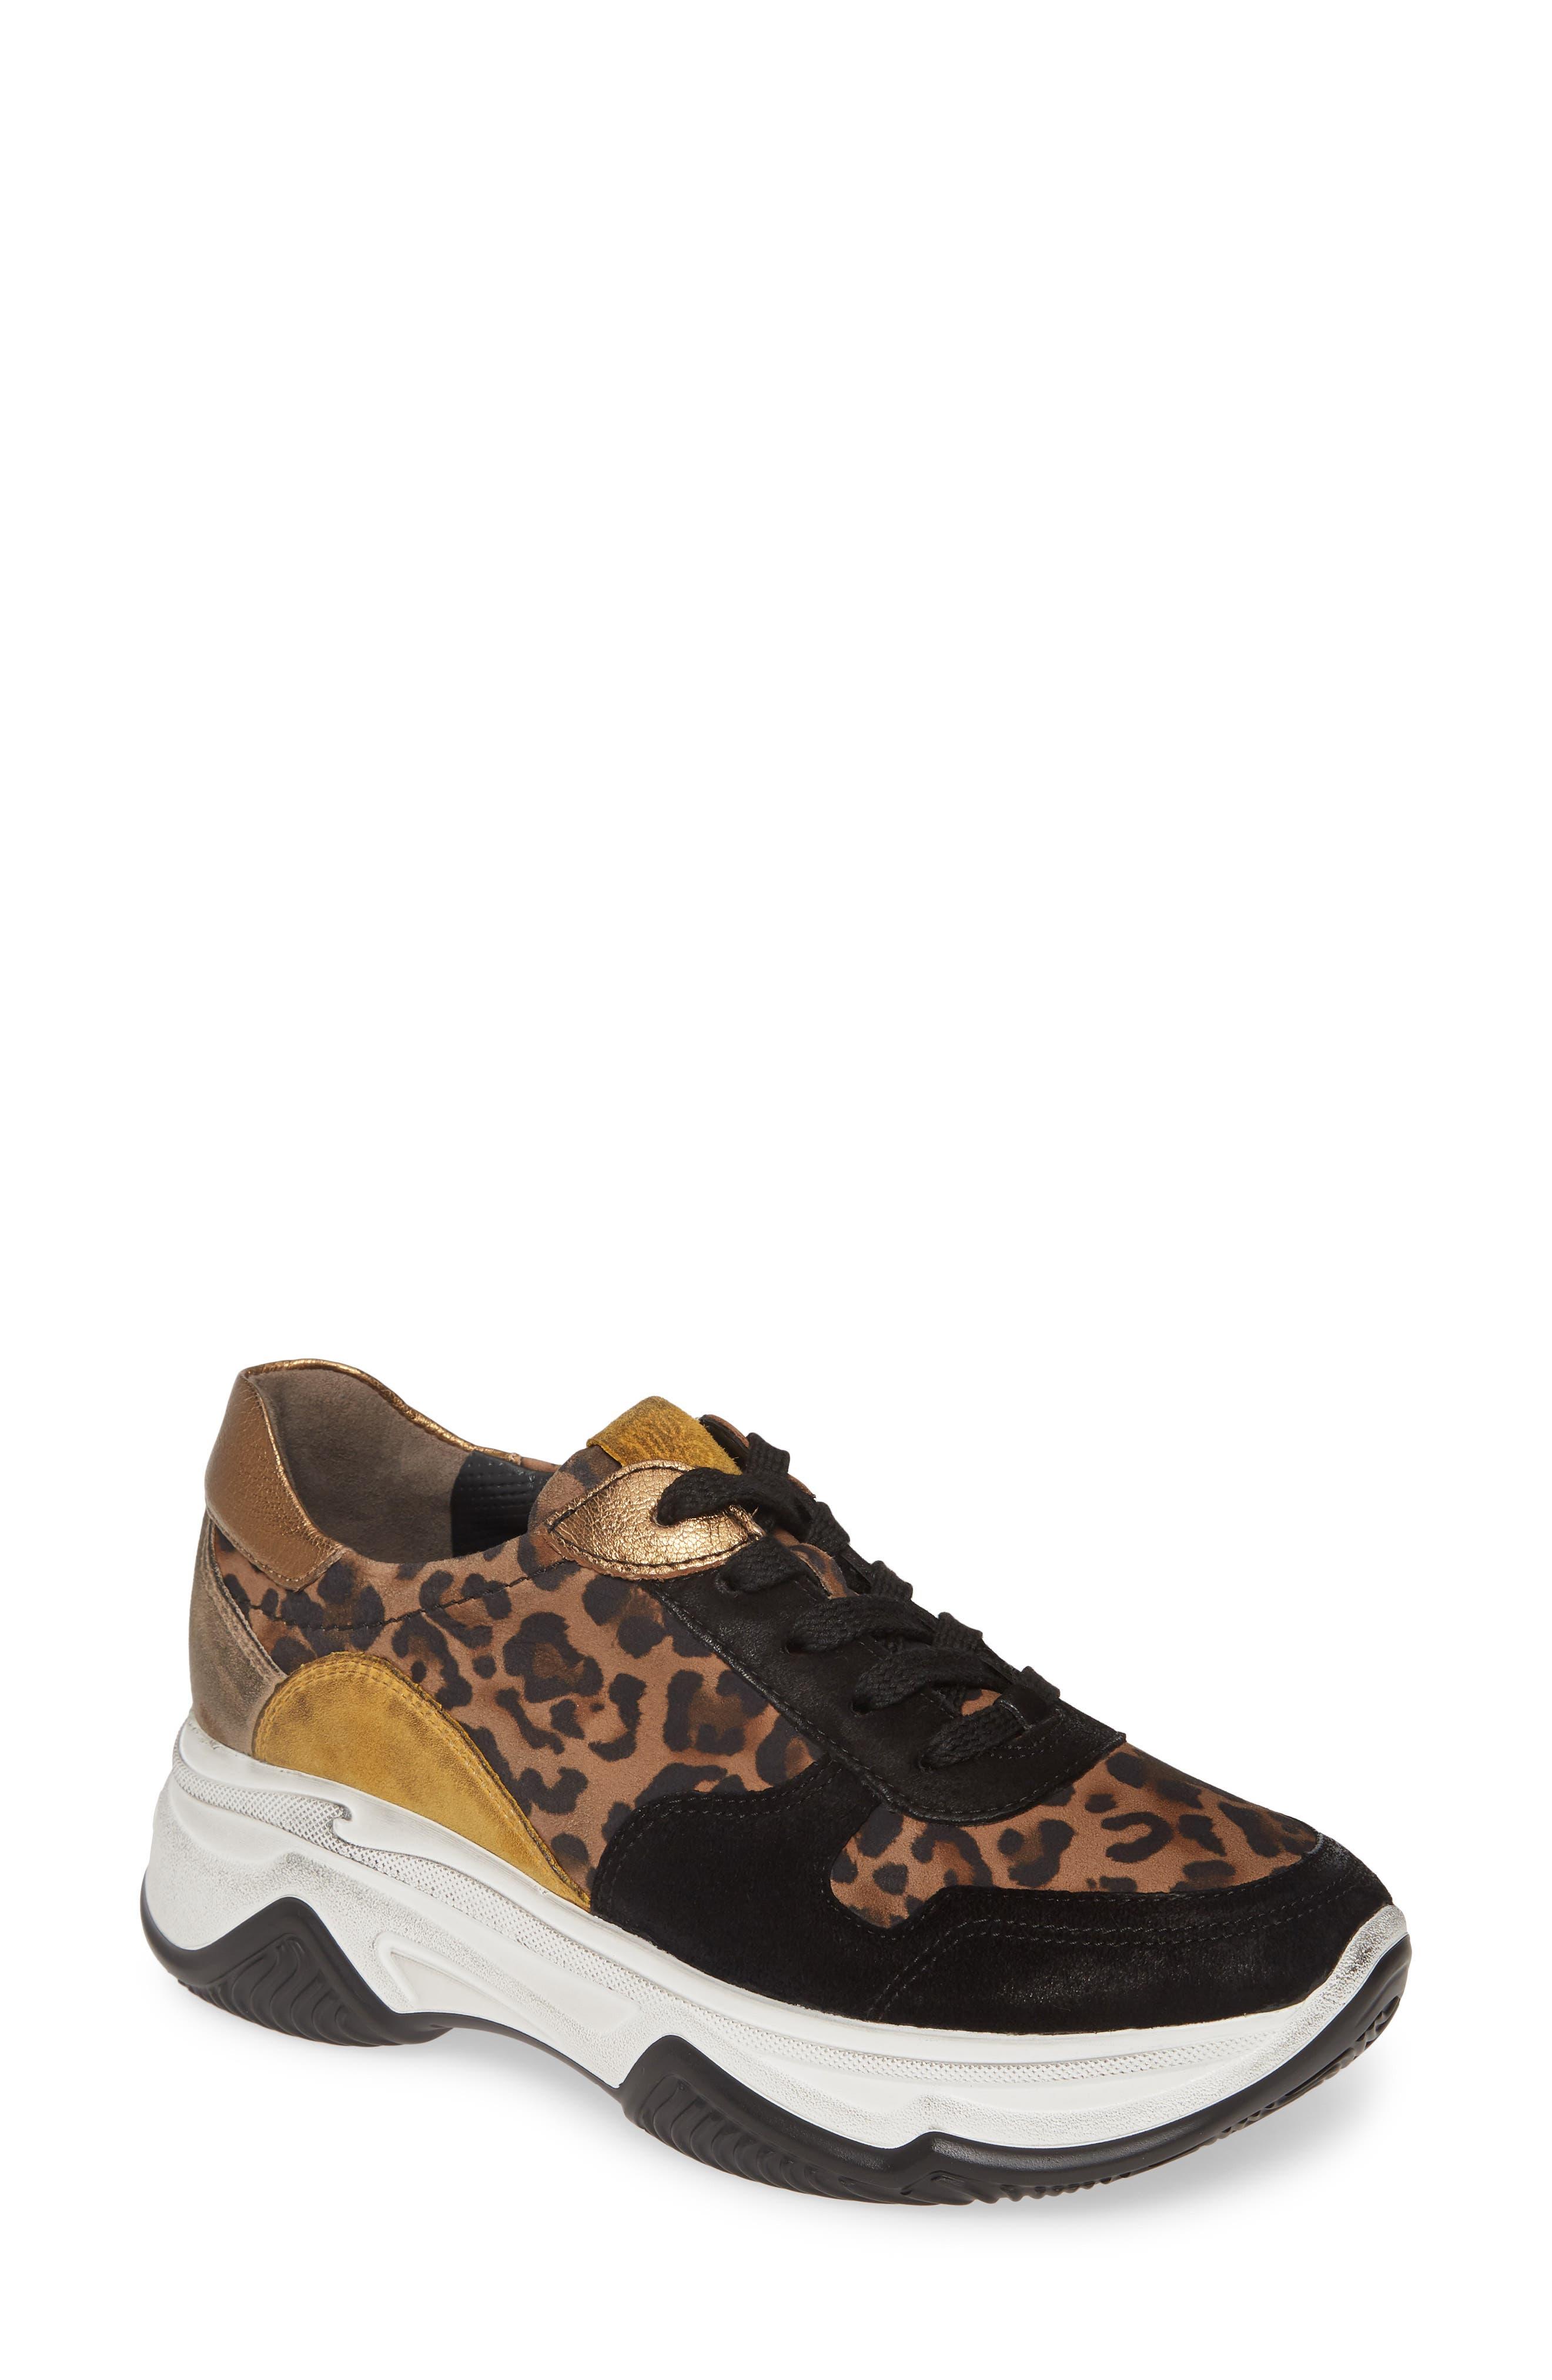 Nike Air 90 Damen Schuhe Max ZiuOPXk